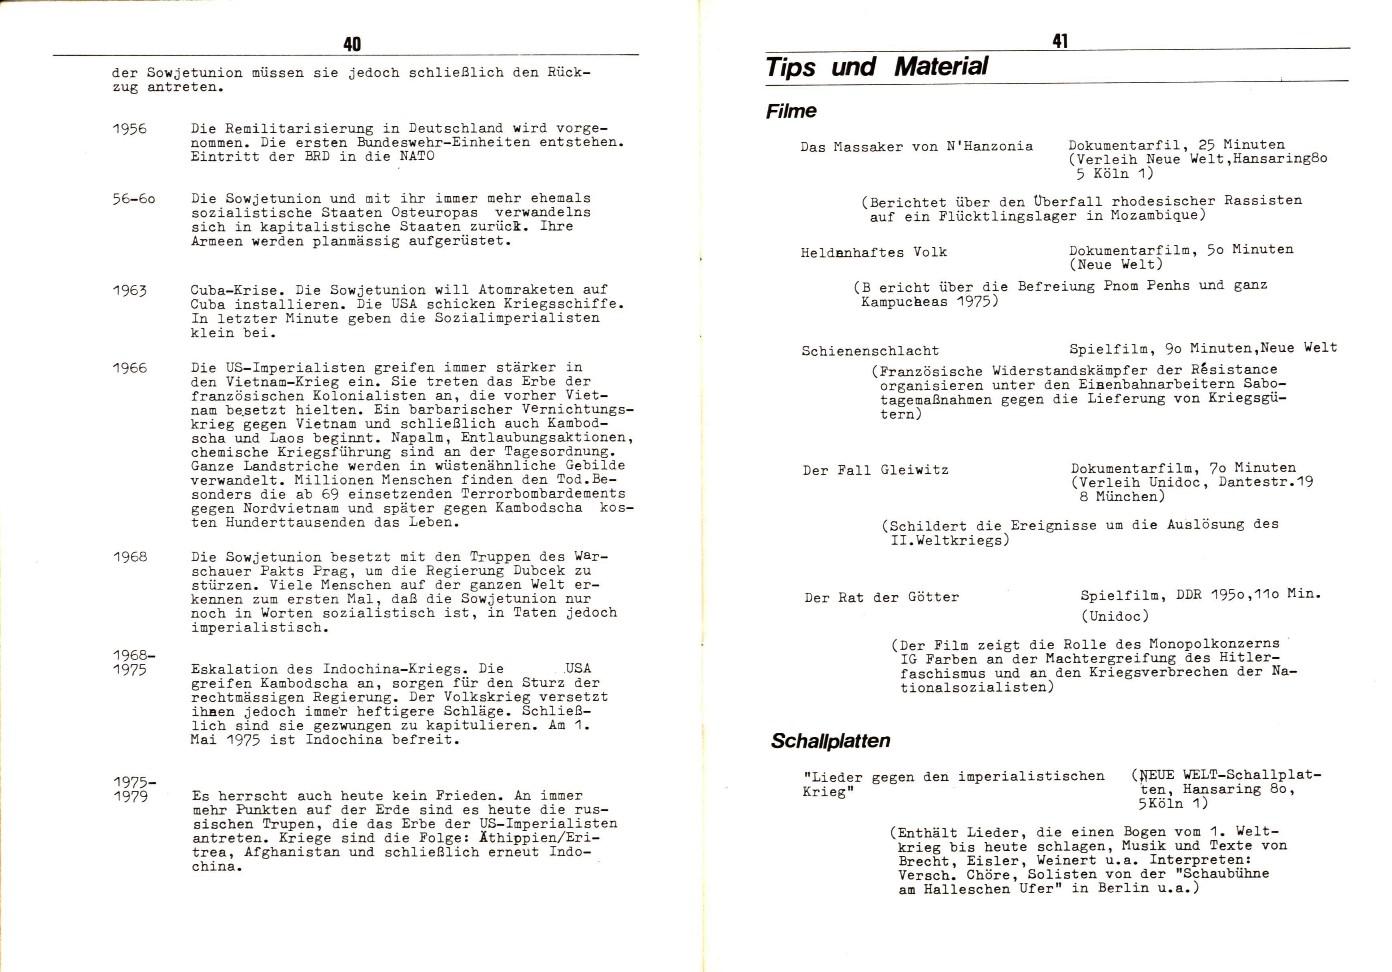 KJVD_1979_Dokumente_zum_Antikriegstag_24